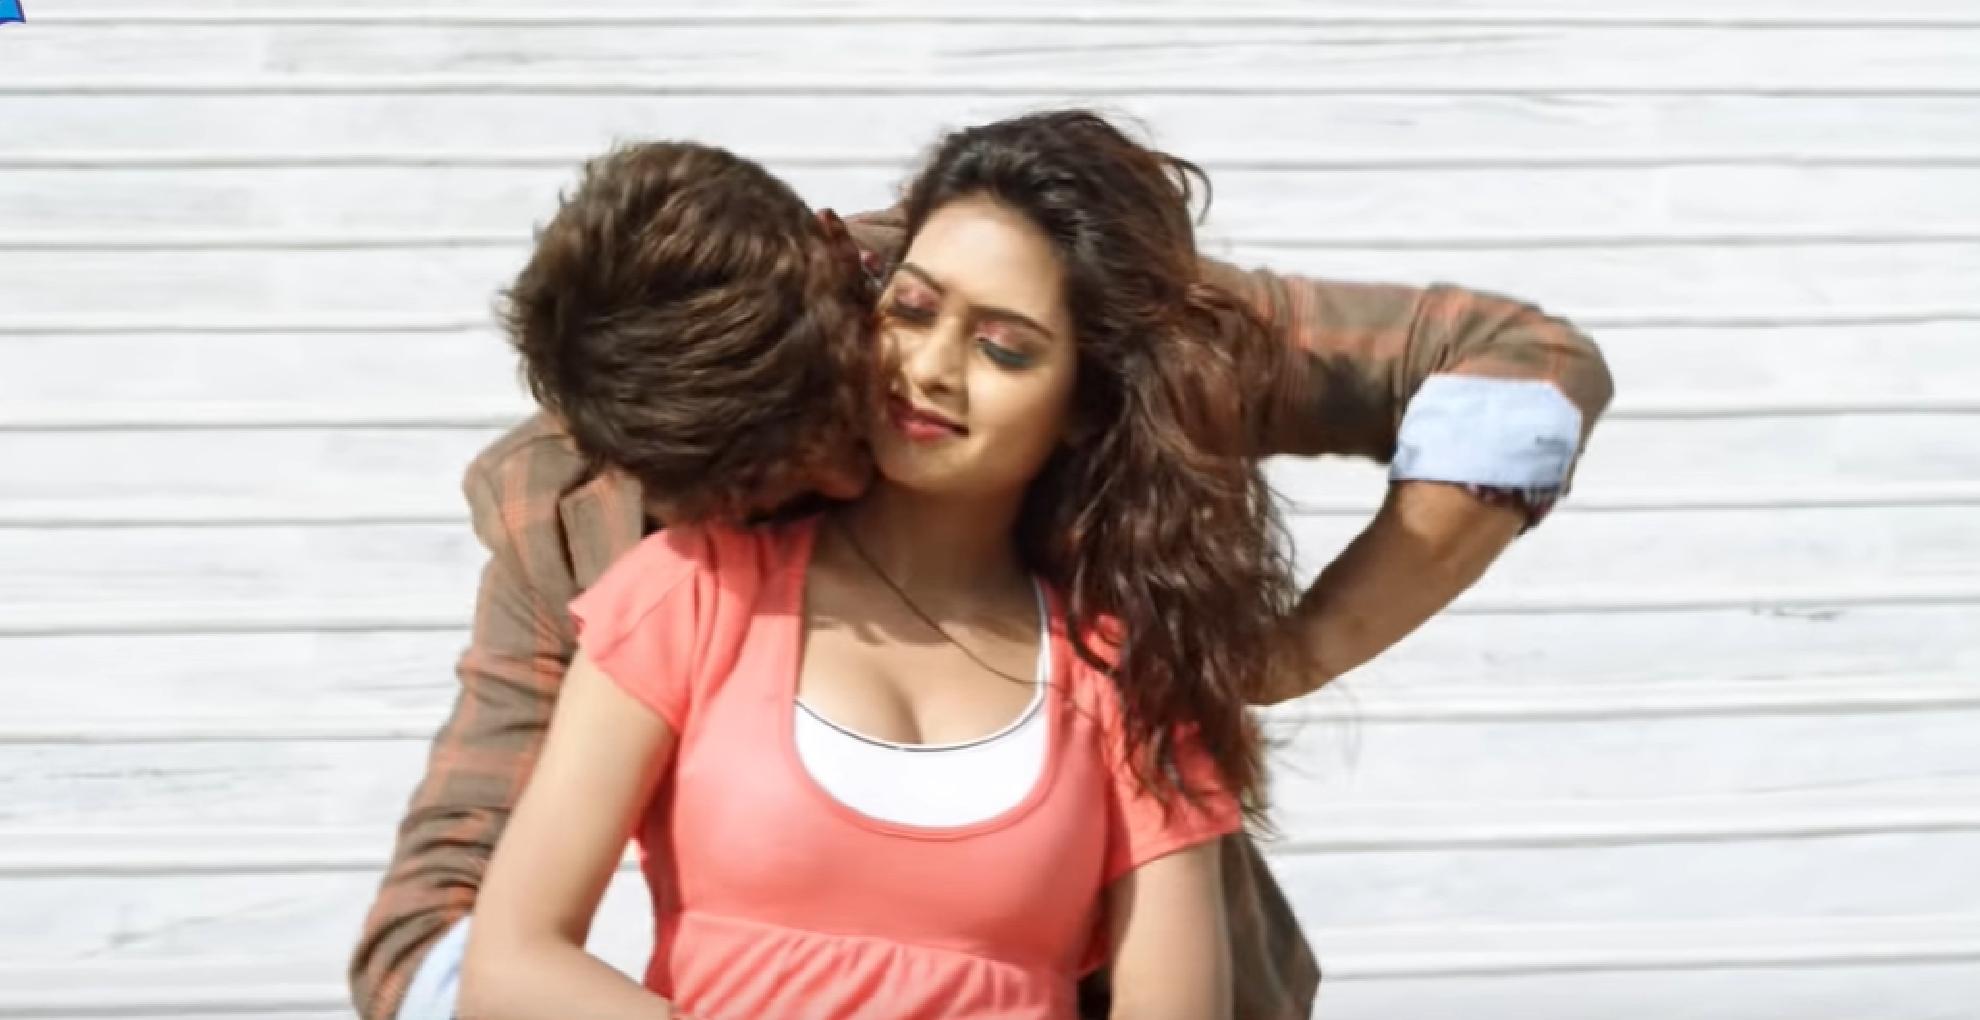 Raja Ho Gail Deewana Trailer: बदले और प्यार की दिखी जबरदस्त कहानी, देखिए फिल्म का दमदार ट्रेलर